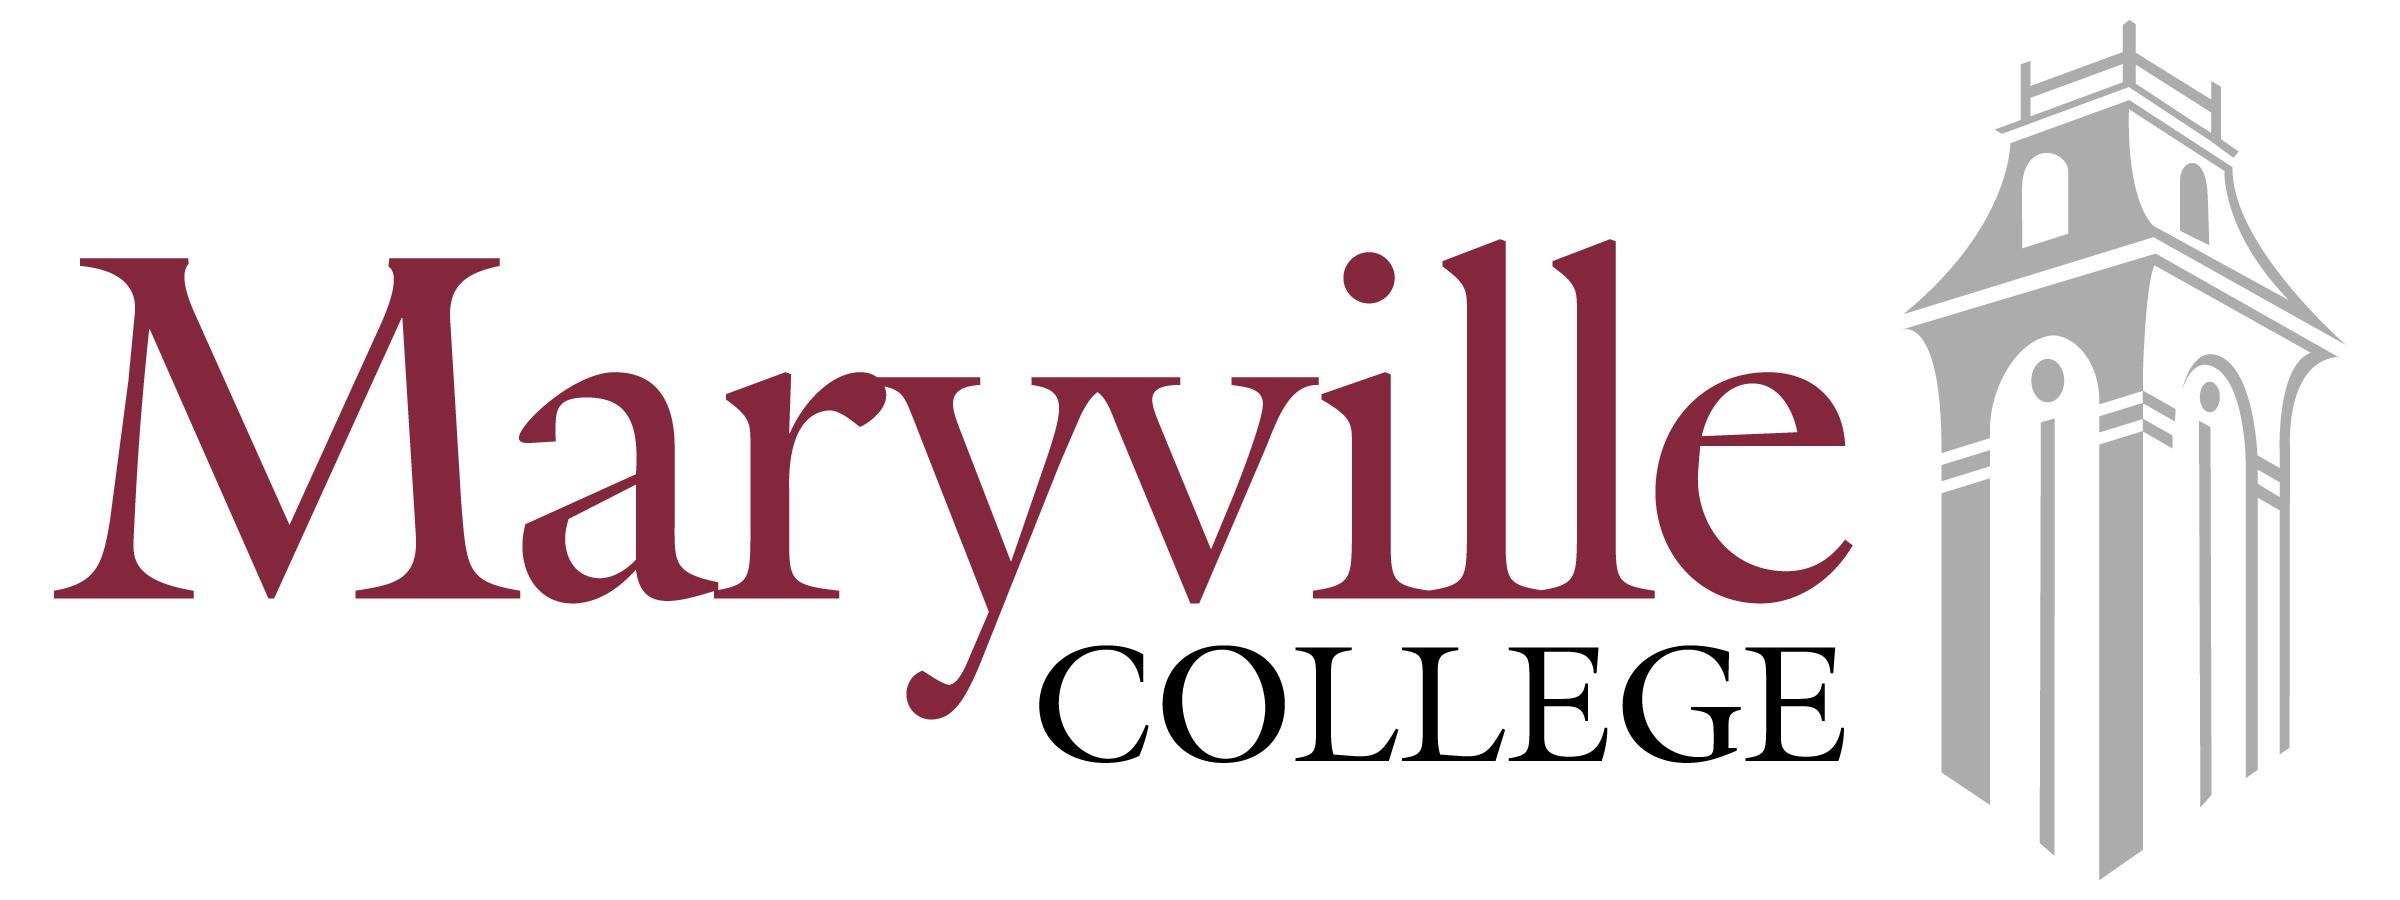 Maryville college logo